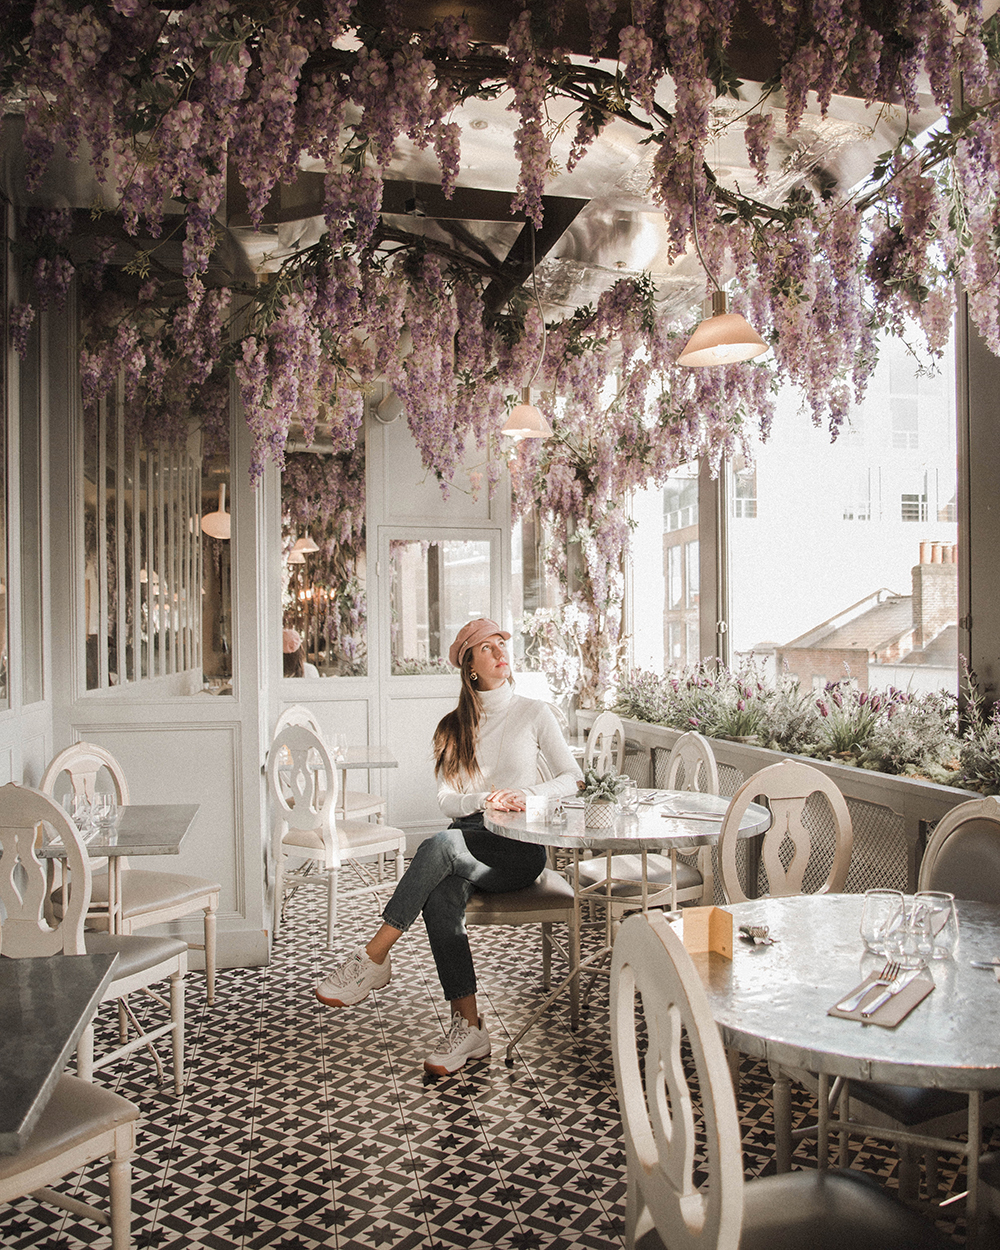 londra ristorante glicine